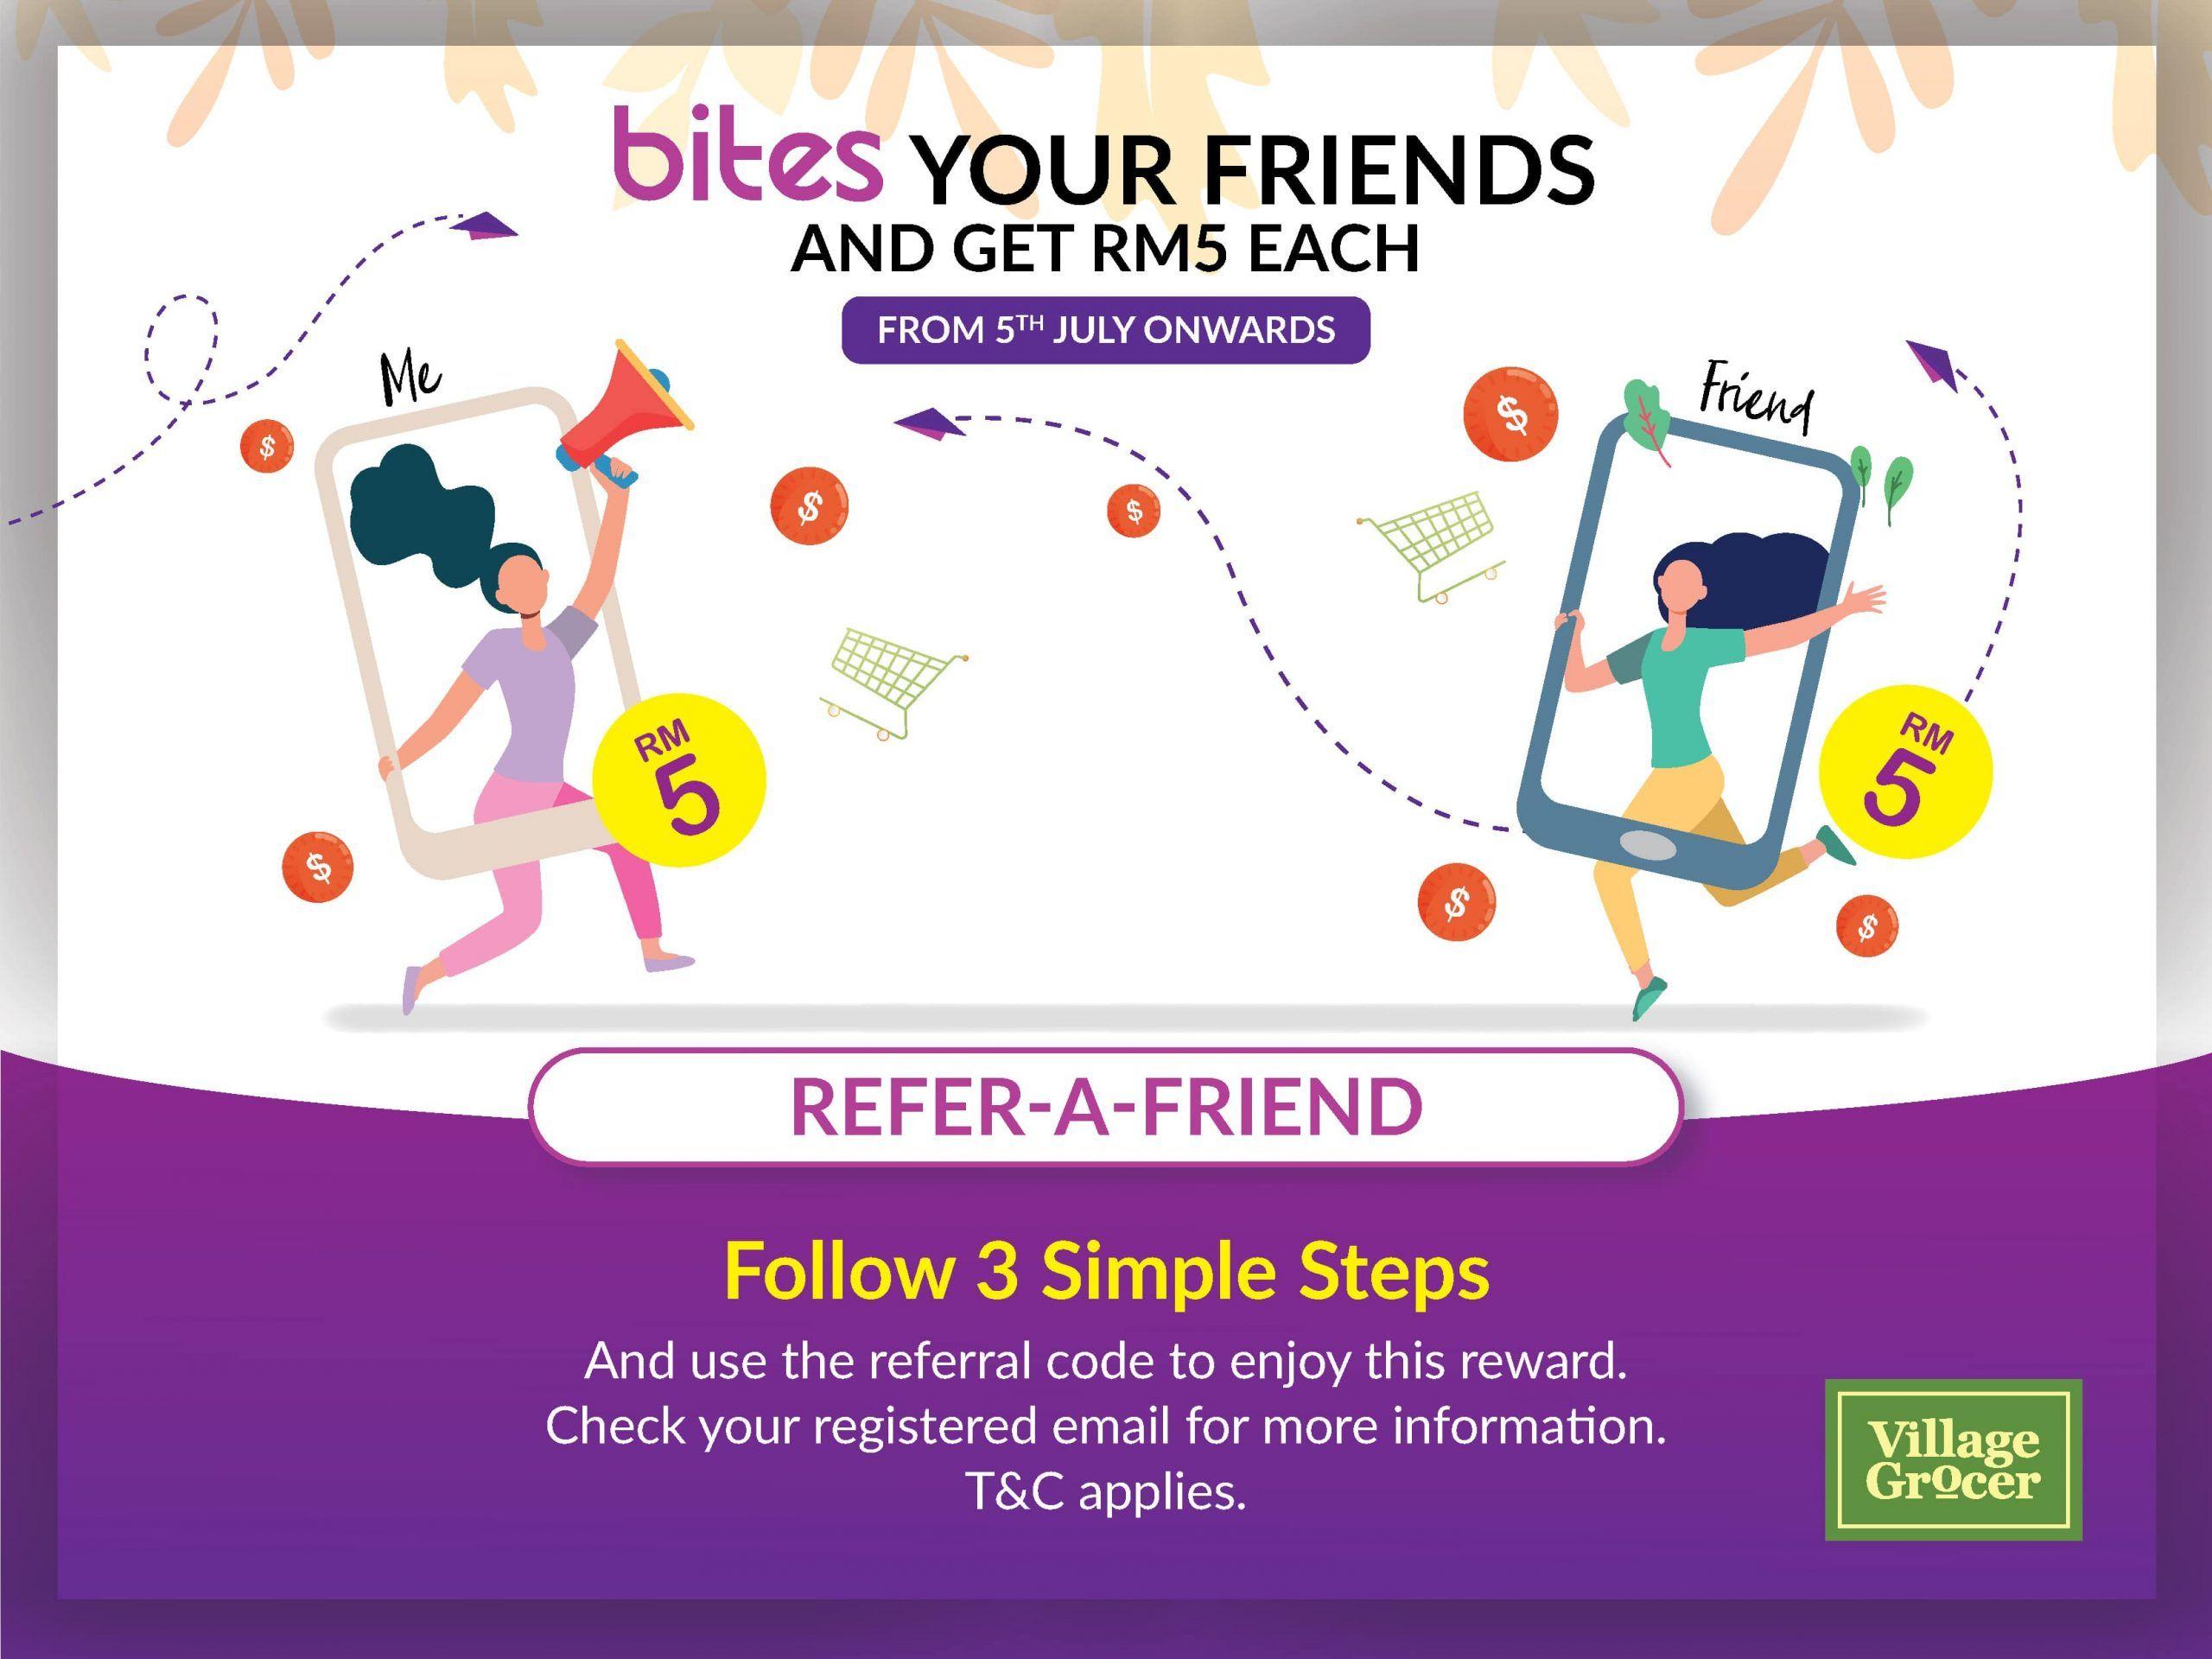 Bites Refer a Friend